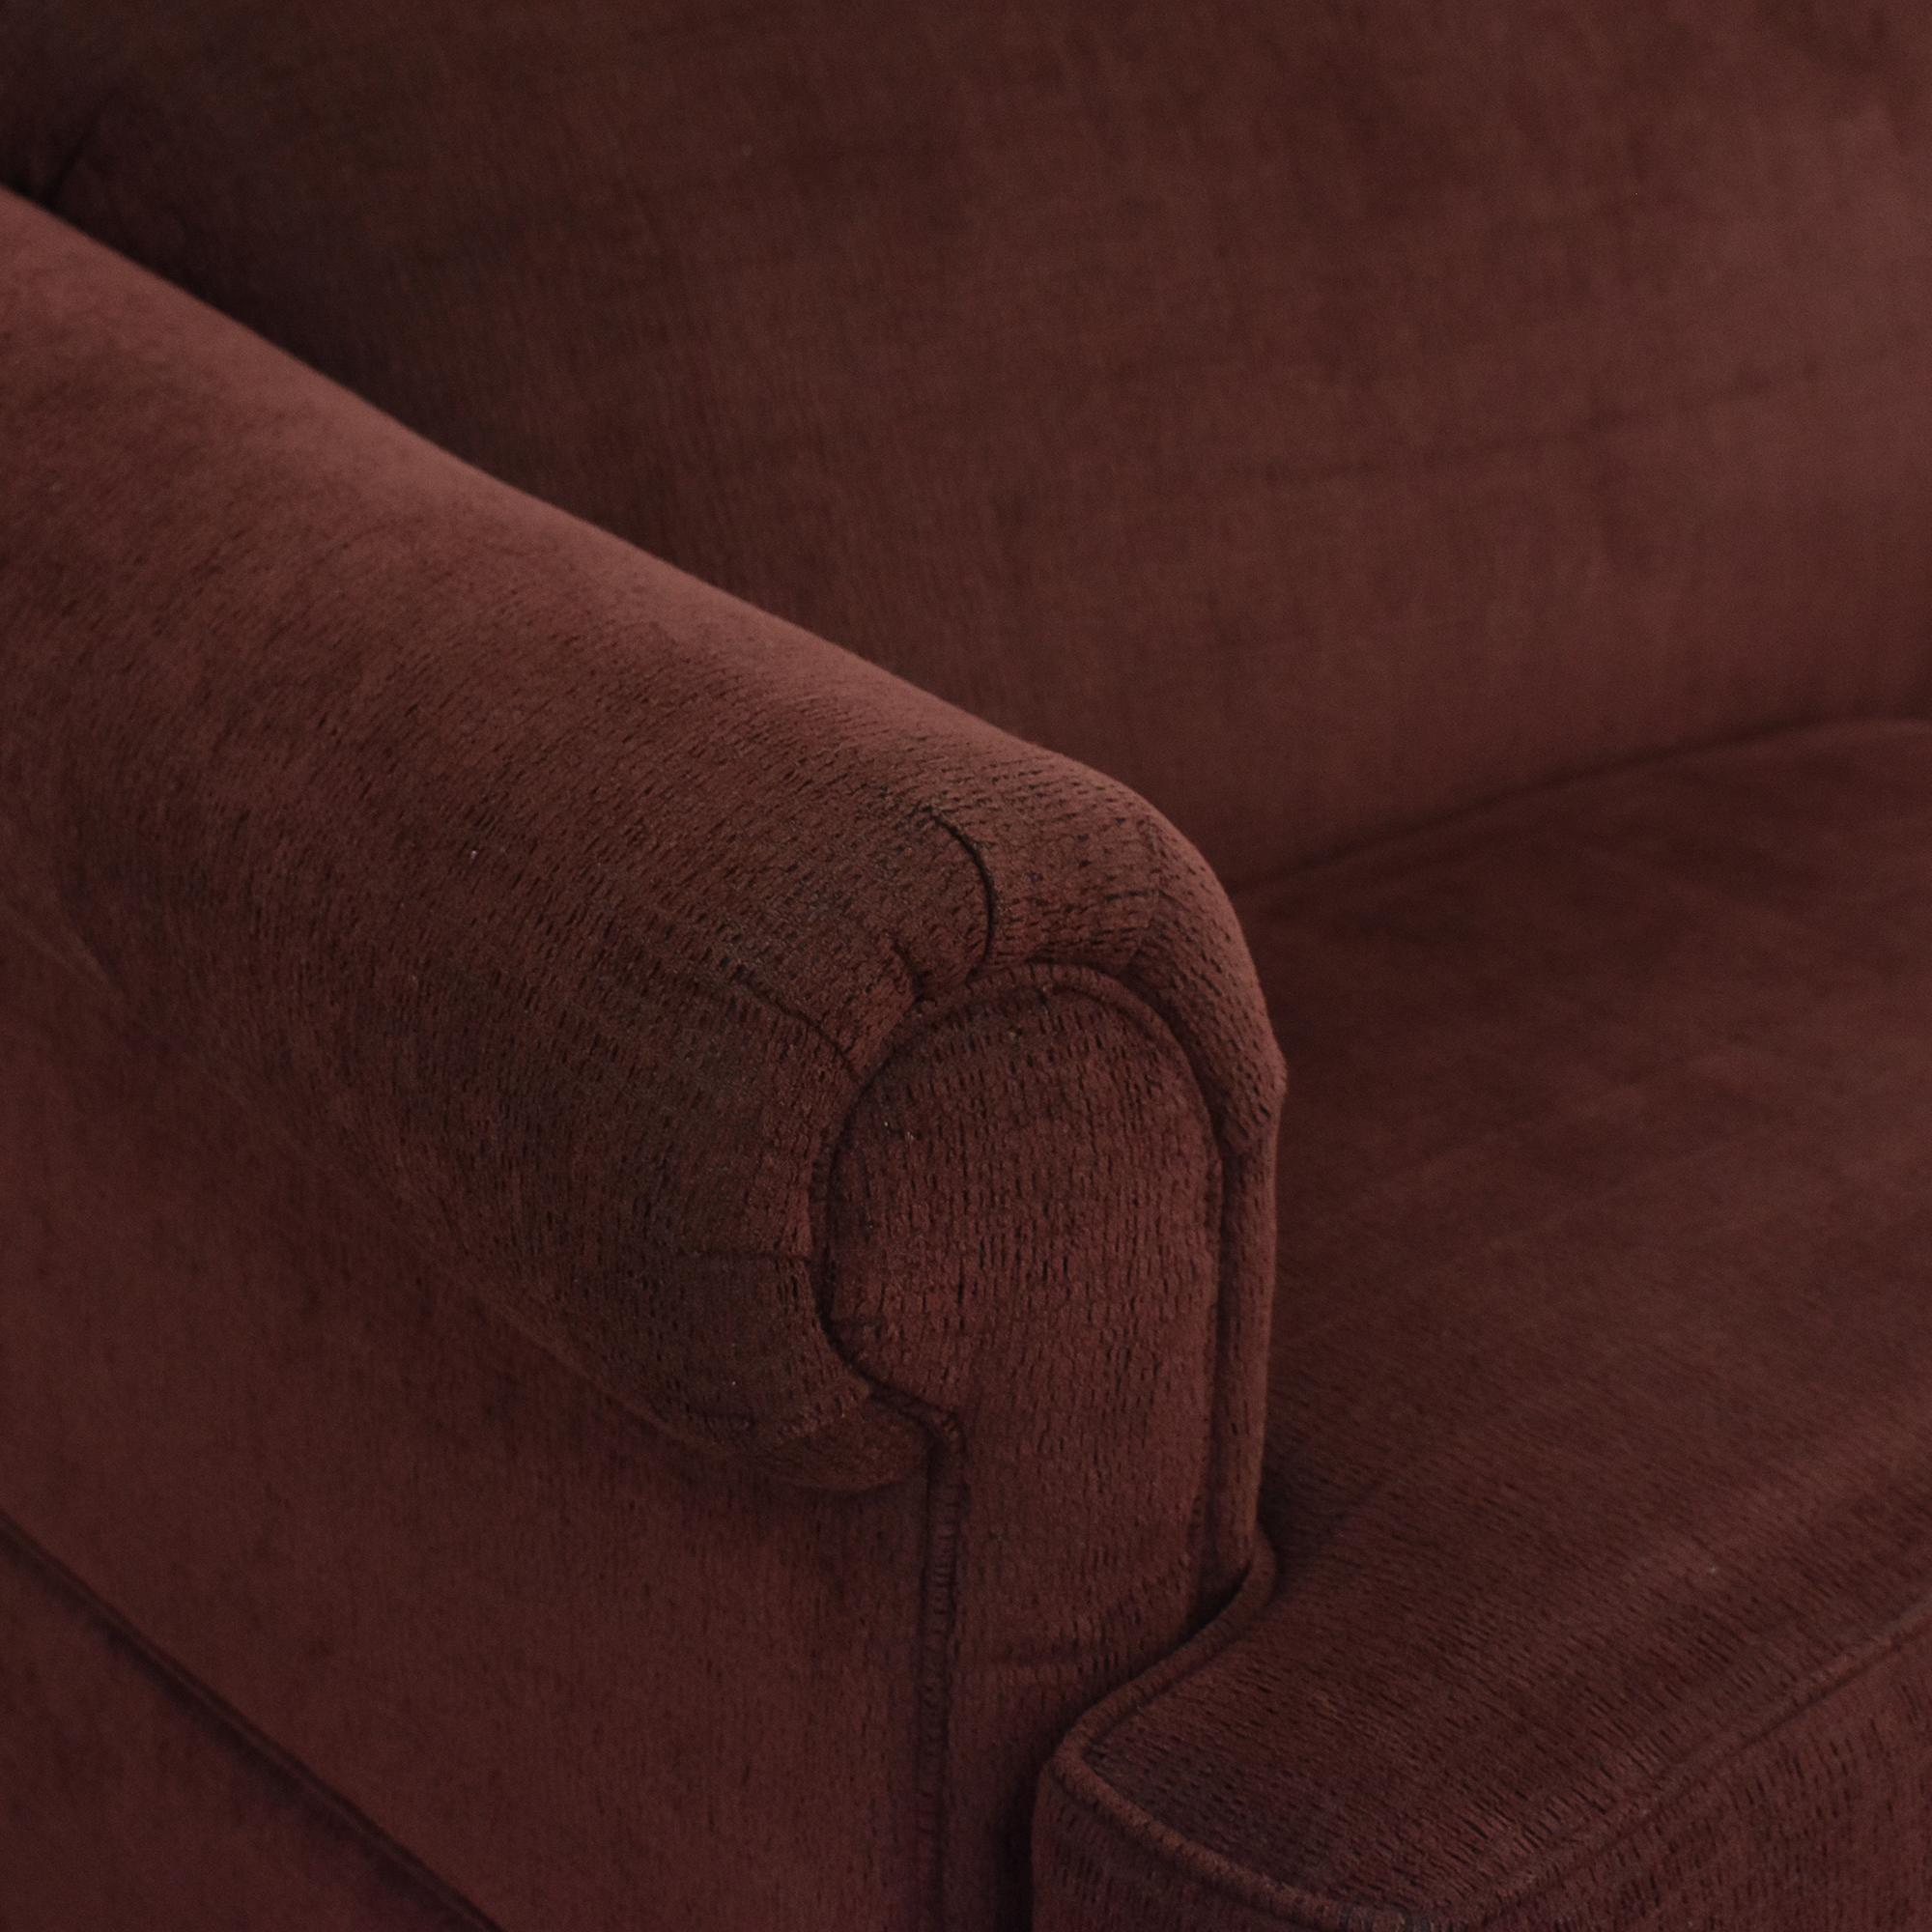 Flexsteel Flexsteel Rolled Arm Sofa on sale